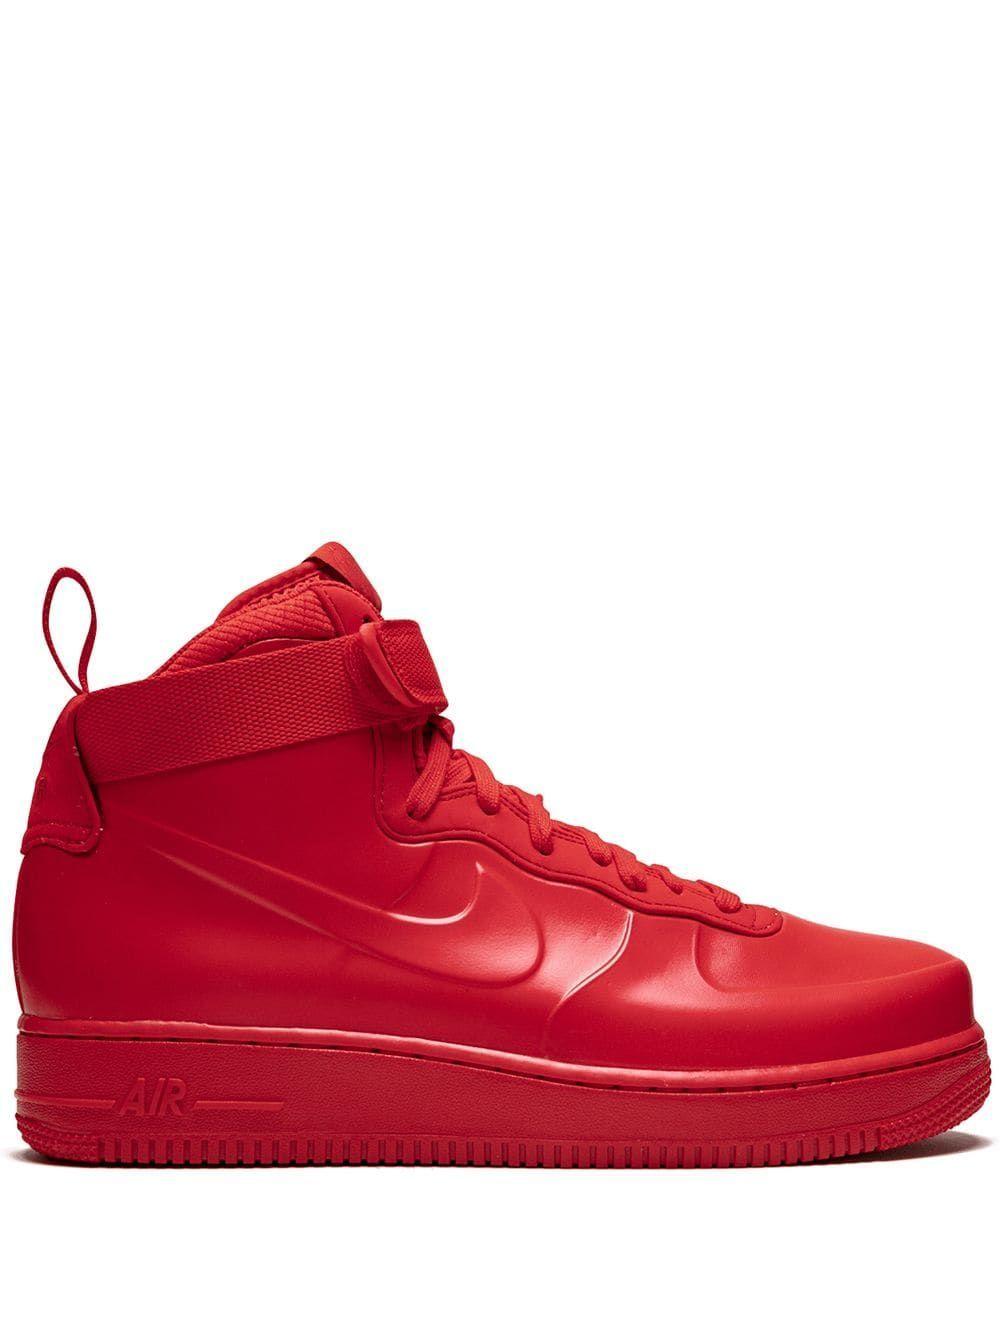 Nike Air Force 1 Foamposite Turnschuhe Rot In 2020 Nike Air Force Nike Air Nike Air Shoes